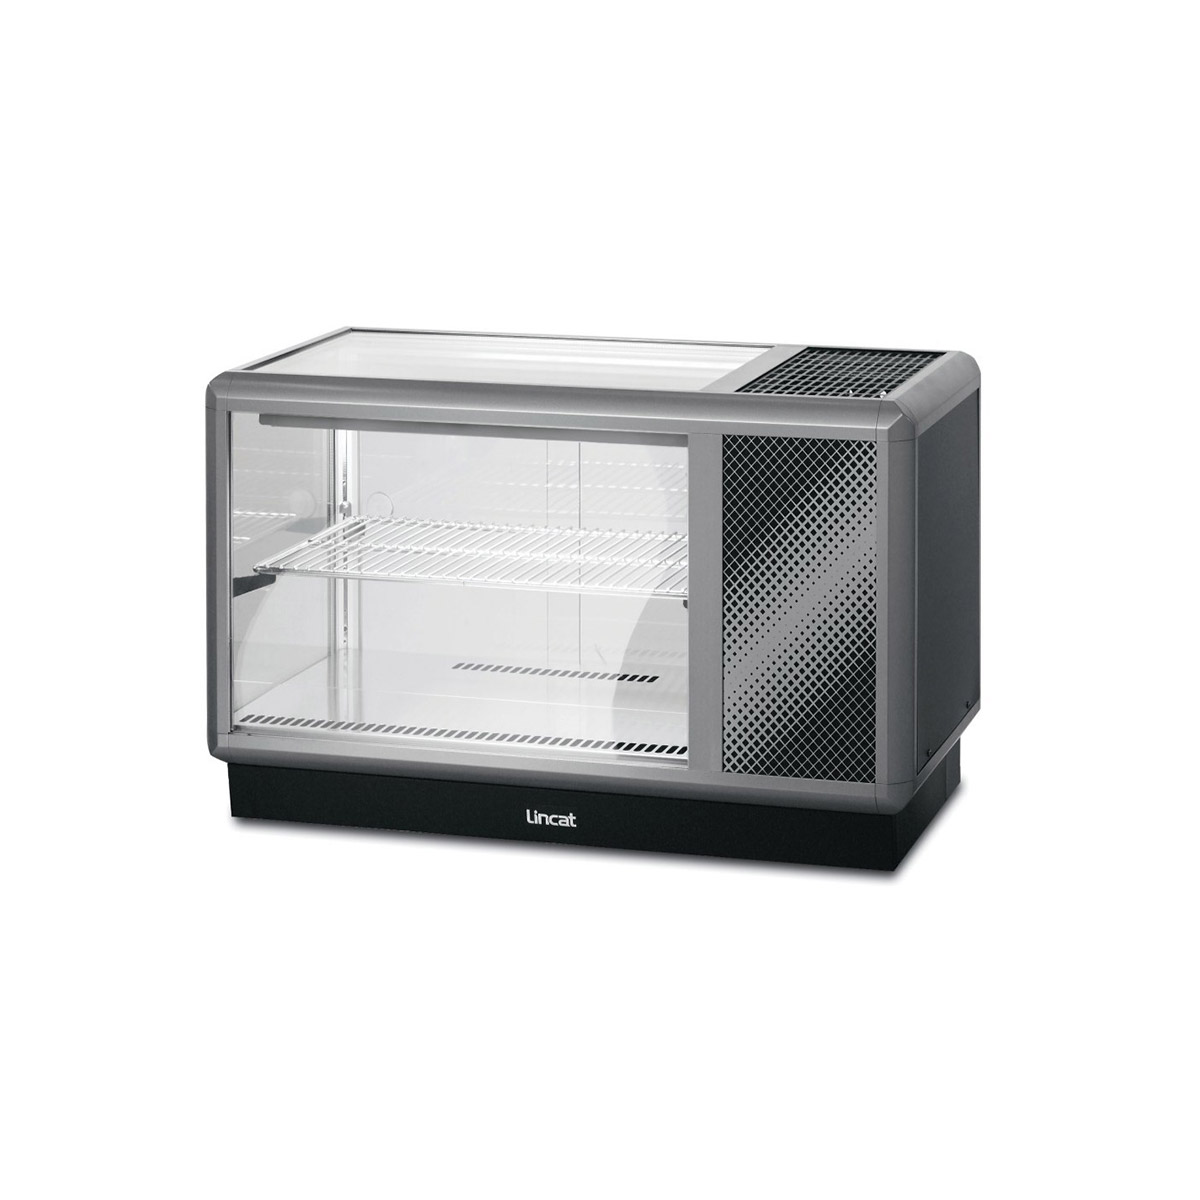 D5R/100B - Lincat Seal 500 Series Counter-top Refrigerated Merchandiser - Back-Service - W 1000 mm - 0.6 kW